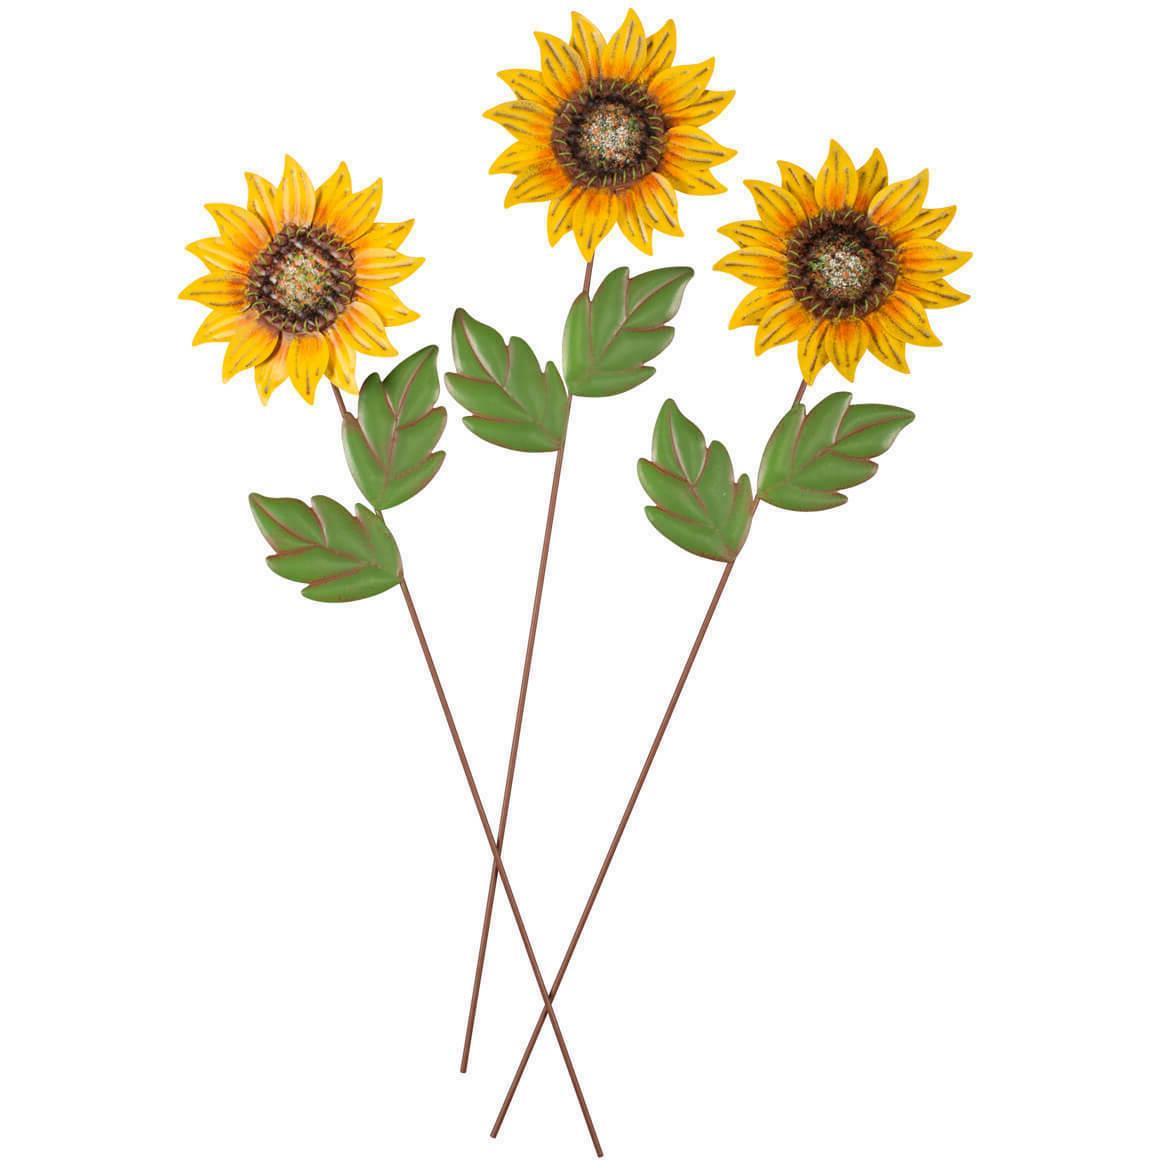 Sunflower Set of 3 Lawn Yard